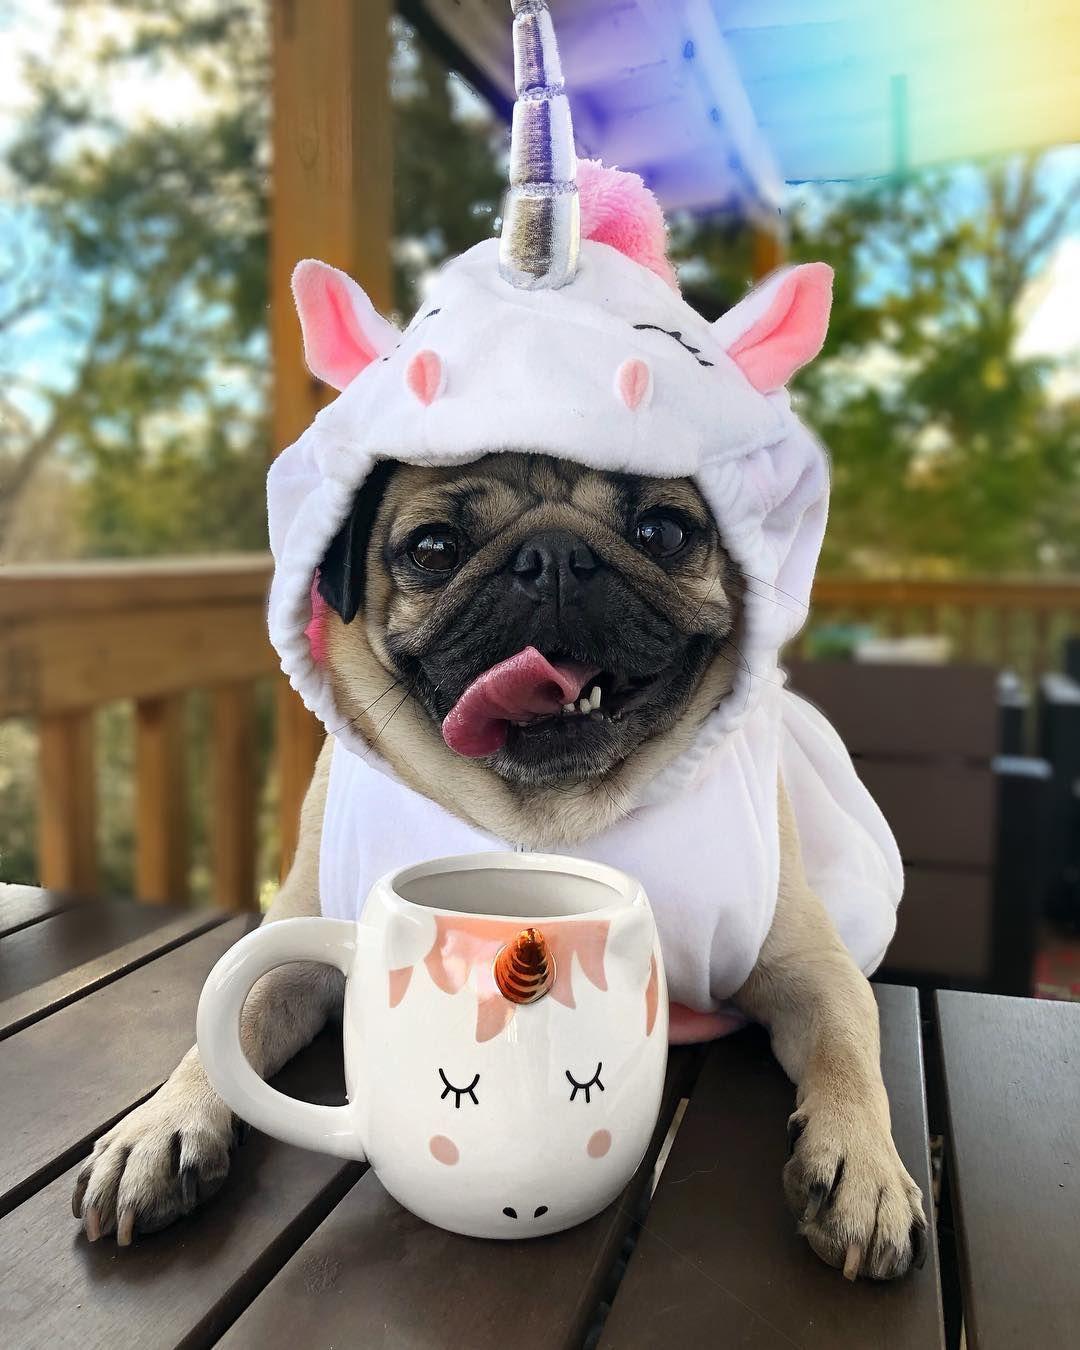 Doug The Pug On Instagram I Hope U Have A Magical Monday